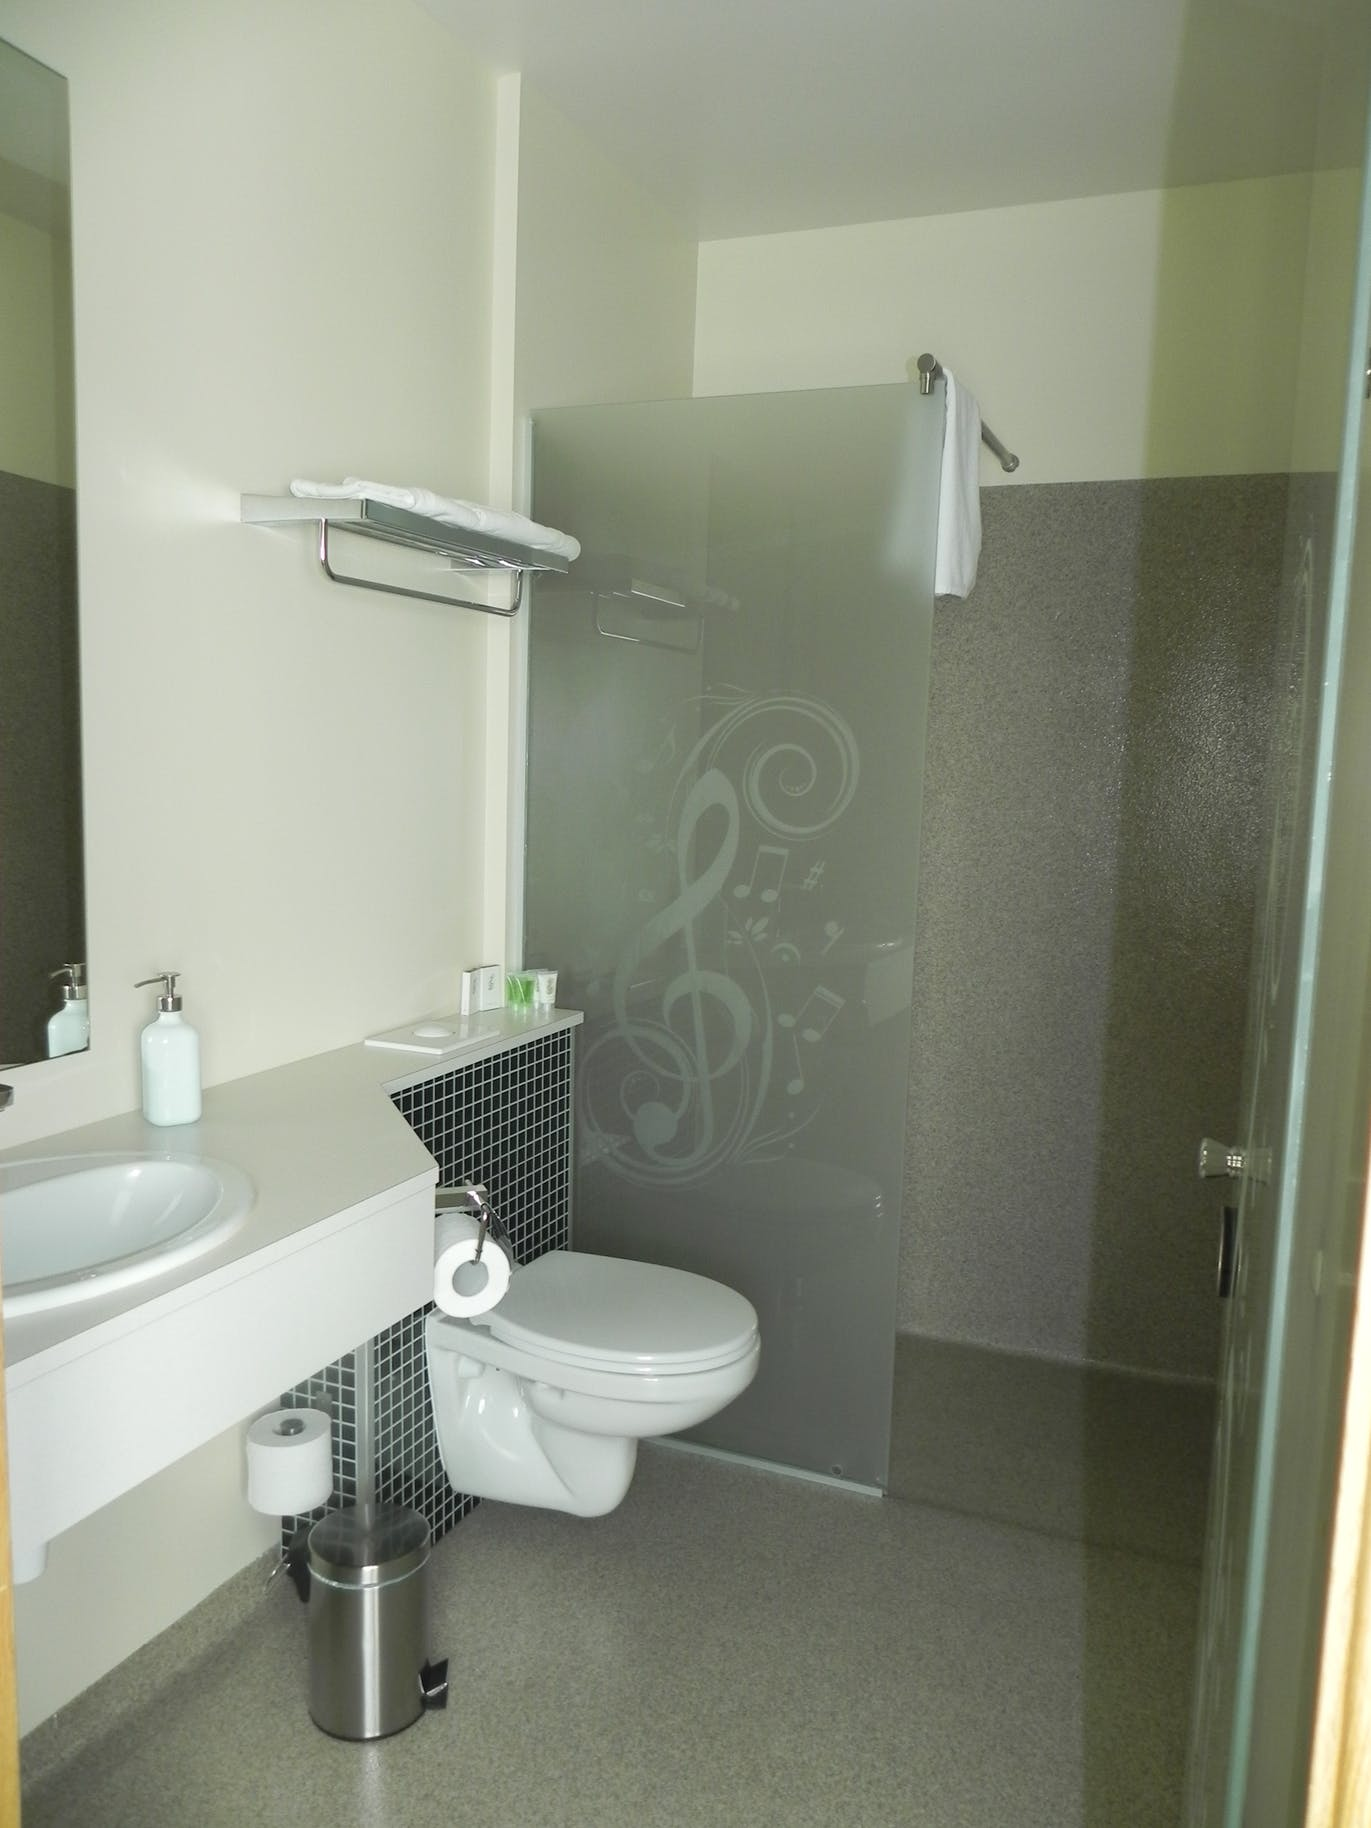 Hótel Jazz - Bathroom2